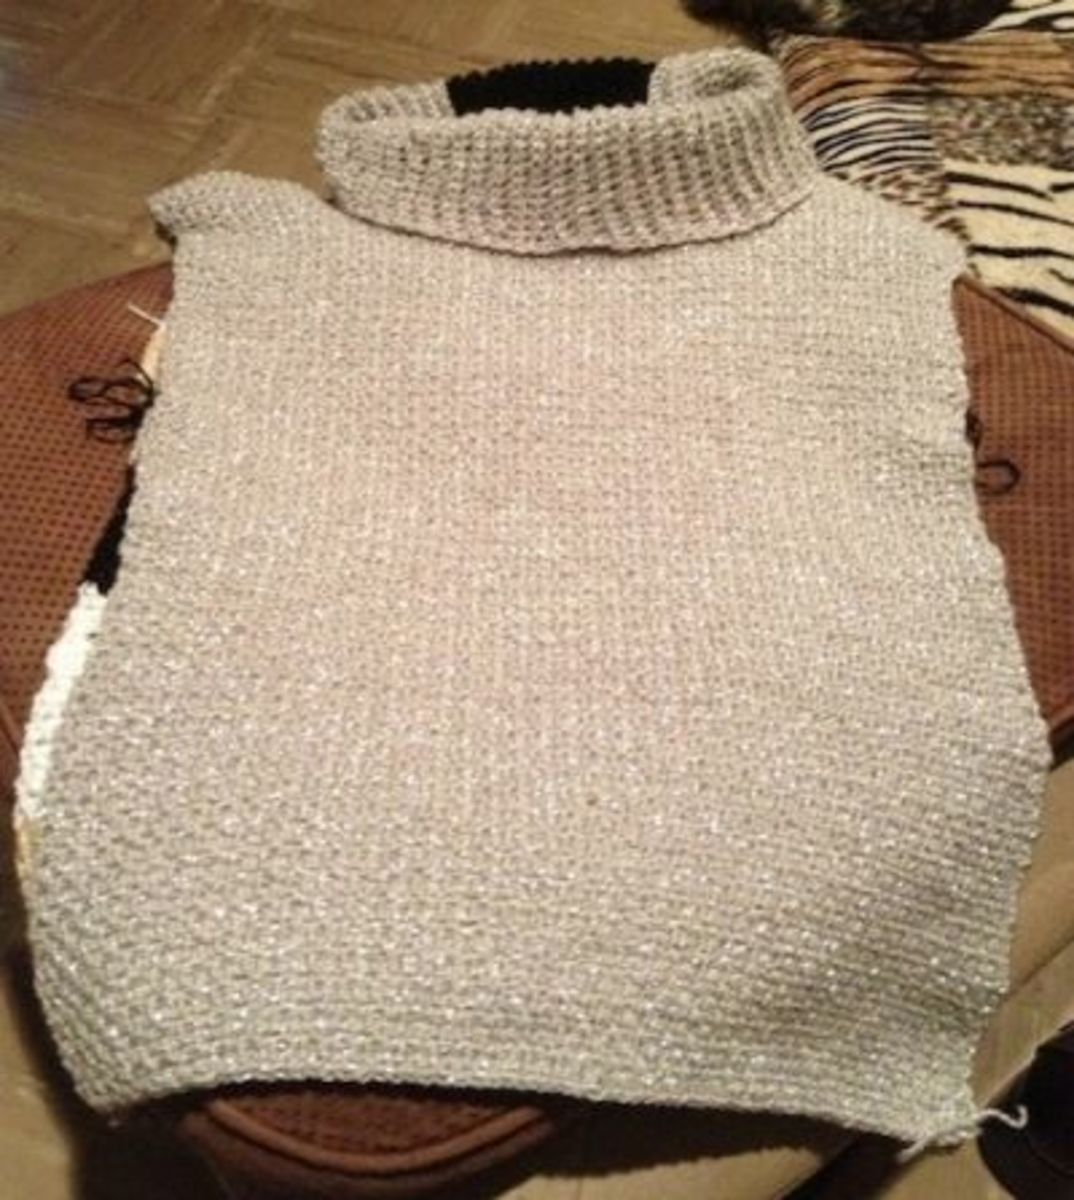 Free Knitting Patterns For Turtleneck Sweaters : Custom Fit Sleeveless Reversible Turtleneck Sweater - Free Crochet Pattern! ...